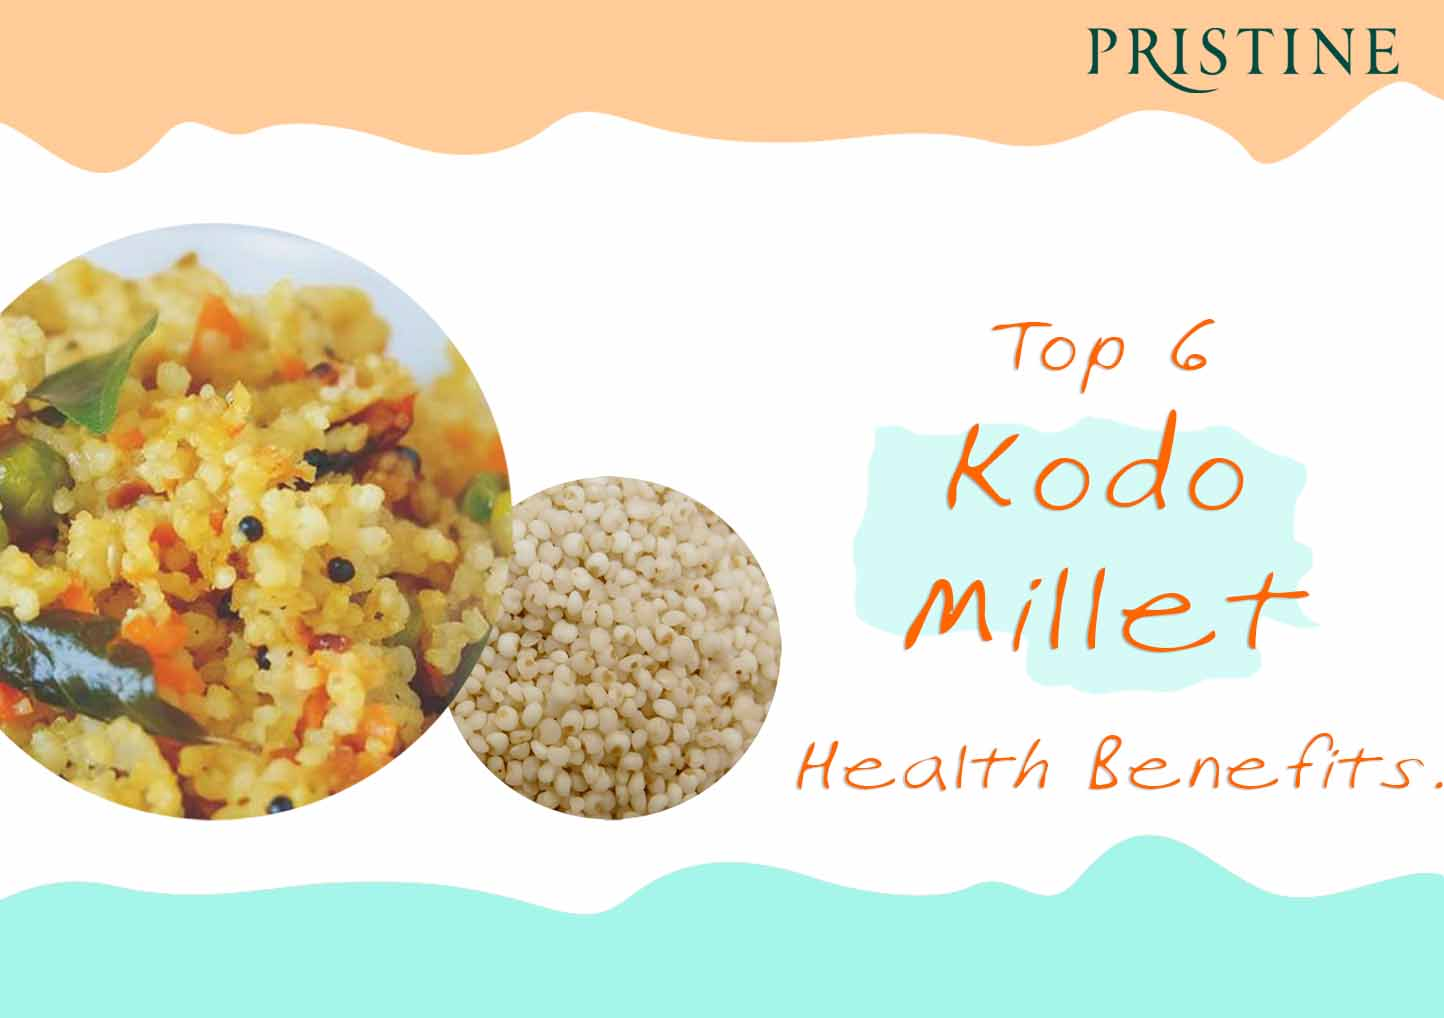 kodo-millet-health-benefits-pristine